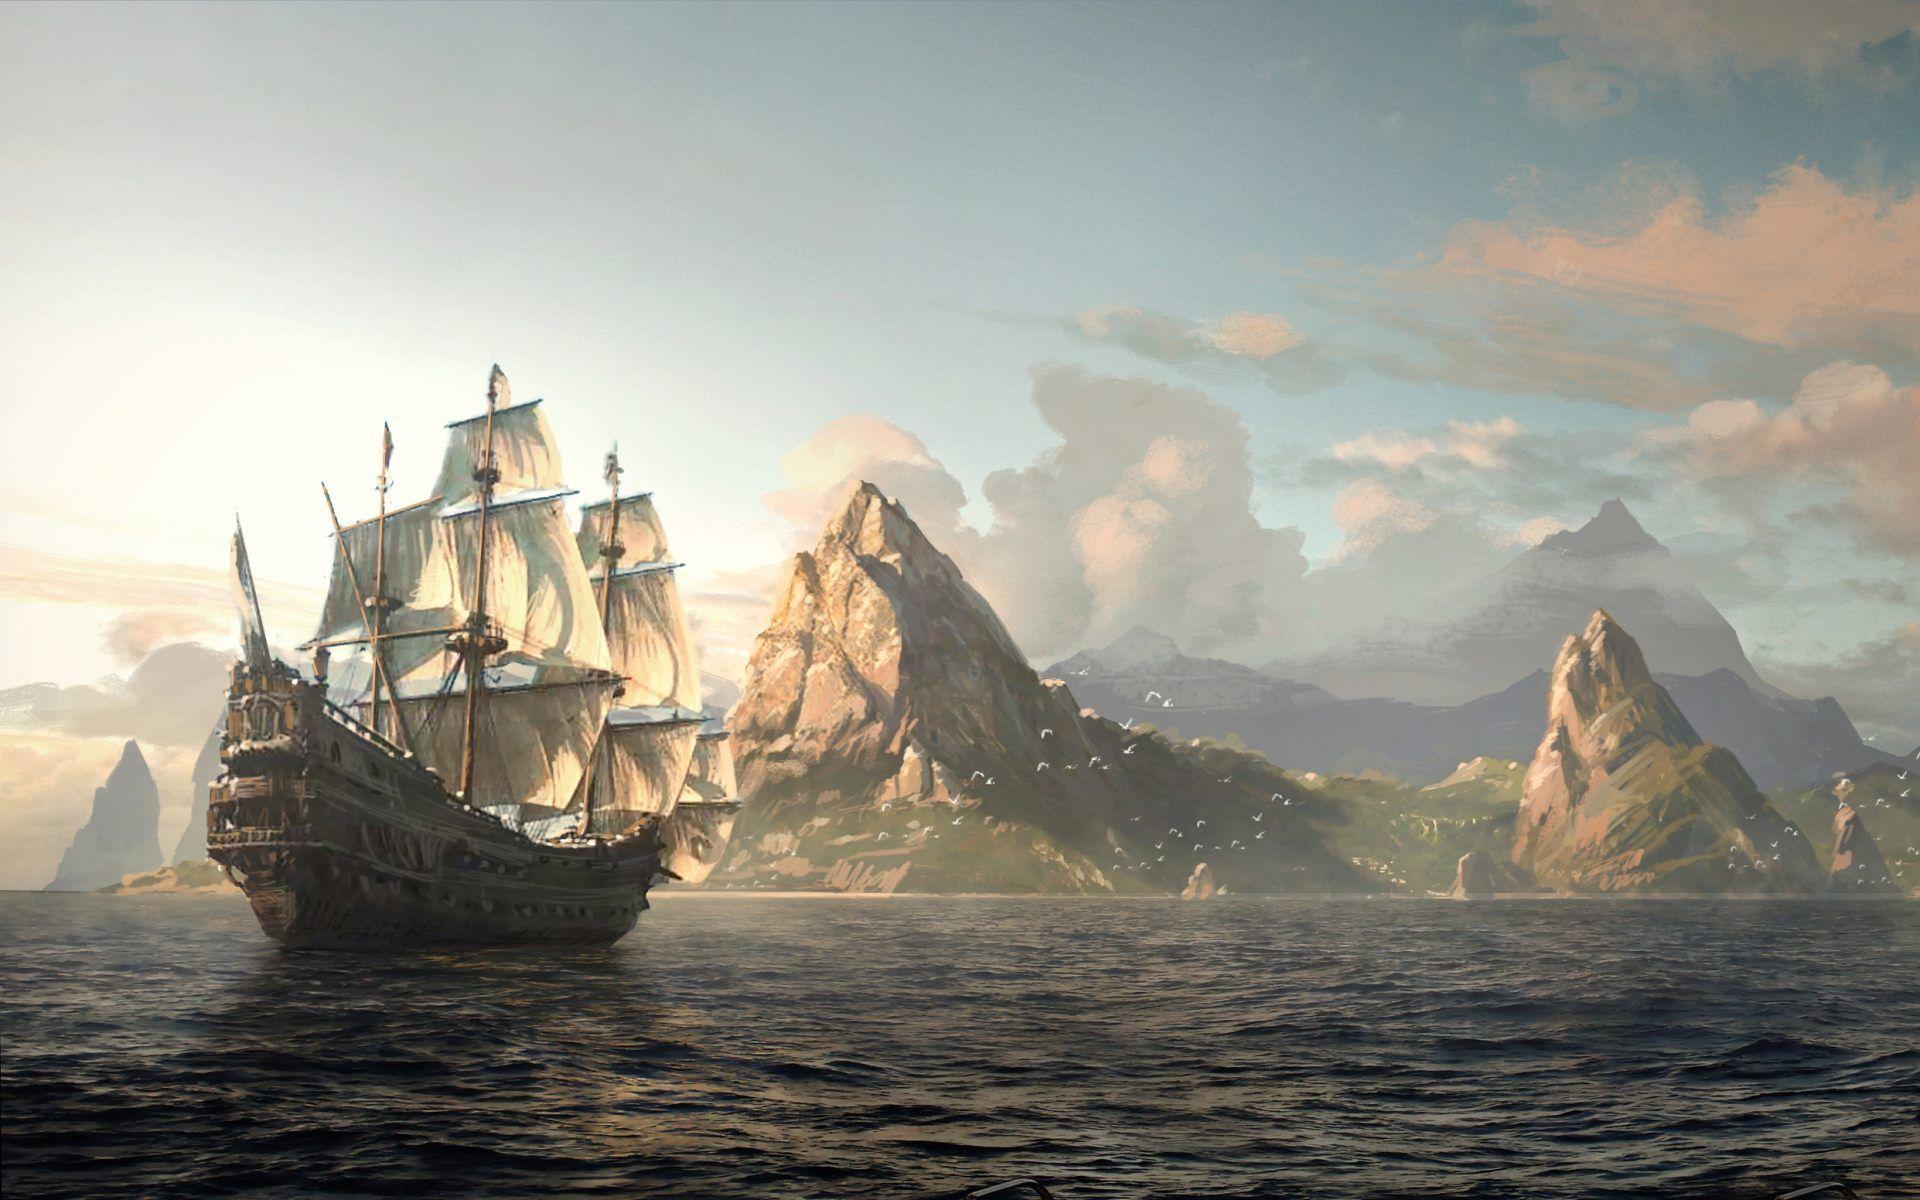 Fantasy ship cliff jolly roger pirate ship rock lightning wallpaper - Pirate Ship Wallpaper Free Sdeerwallpaper